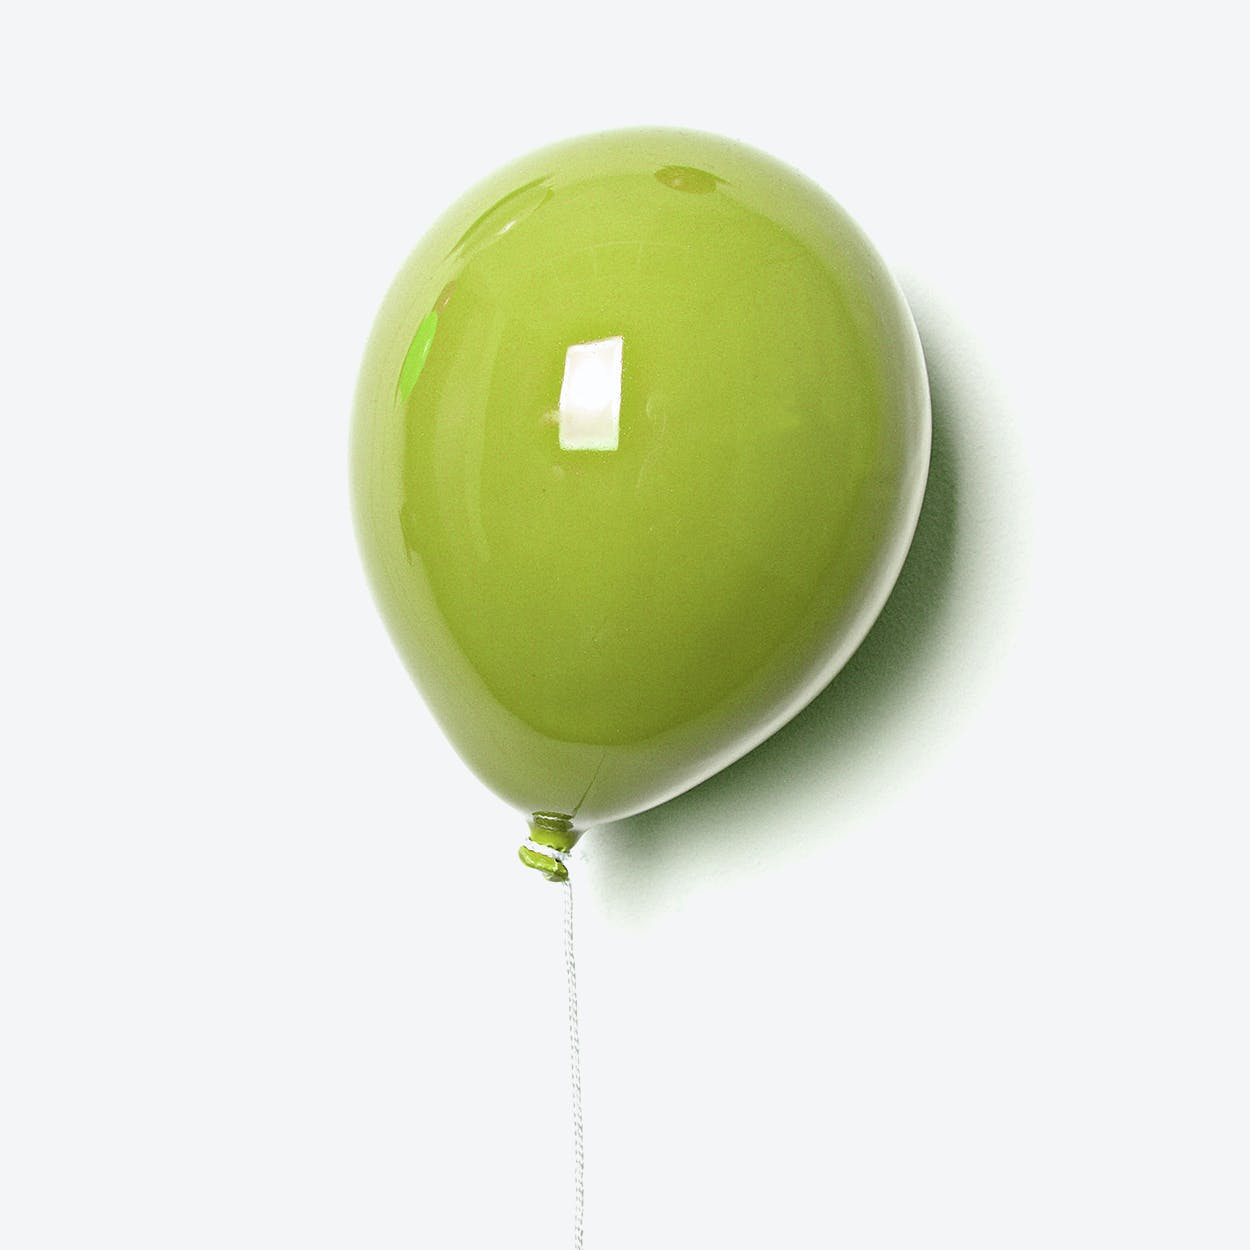 Ceramic Balloon Wall Decor in Green